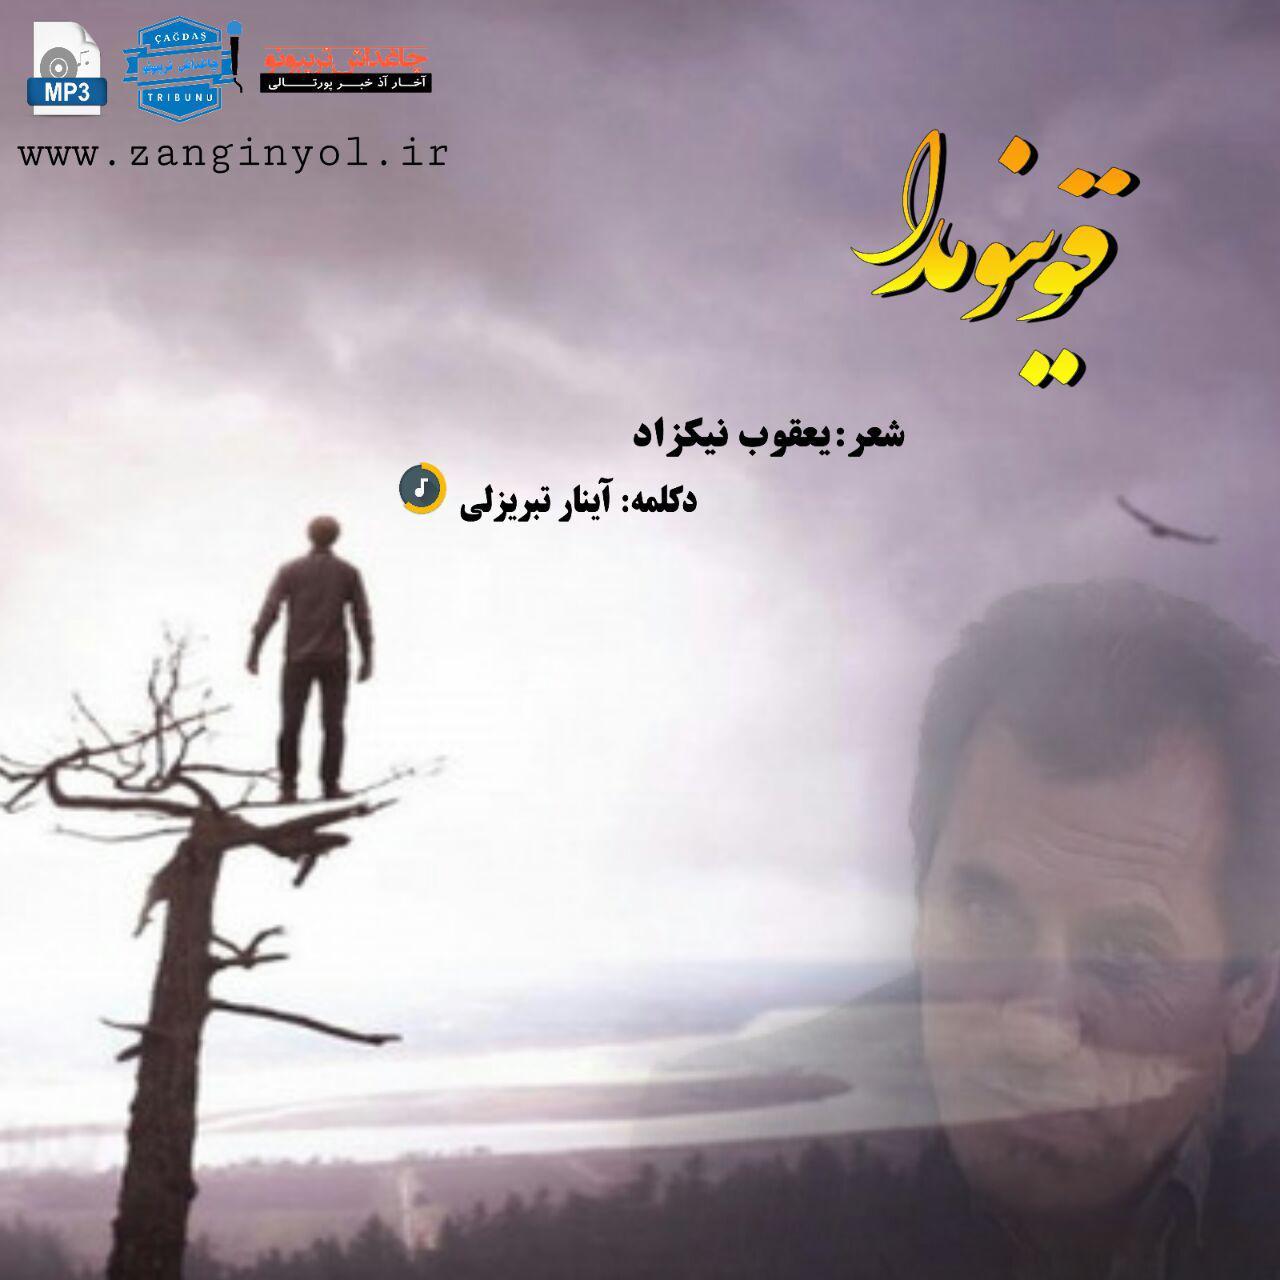 http://s8.picofile.com/file/8334789818/04Aynar_Tabrizli_Qoynumda.jpg